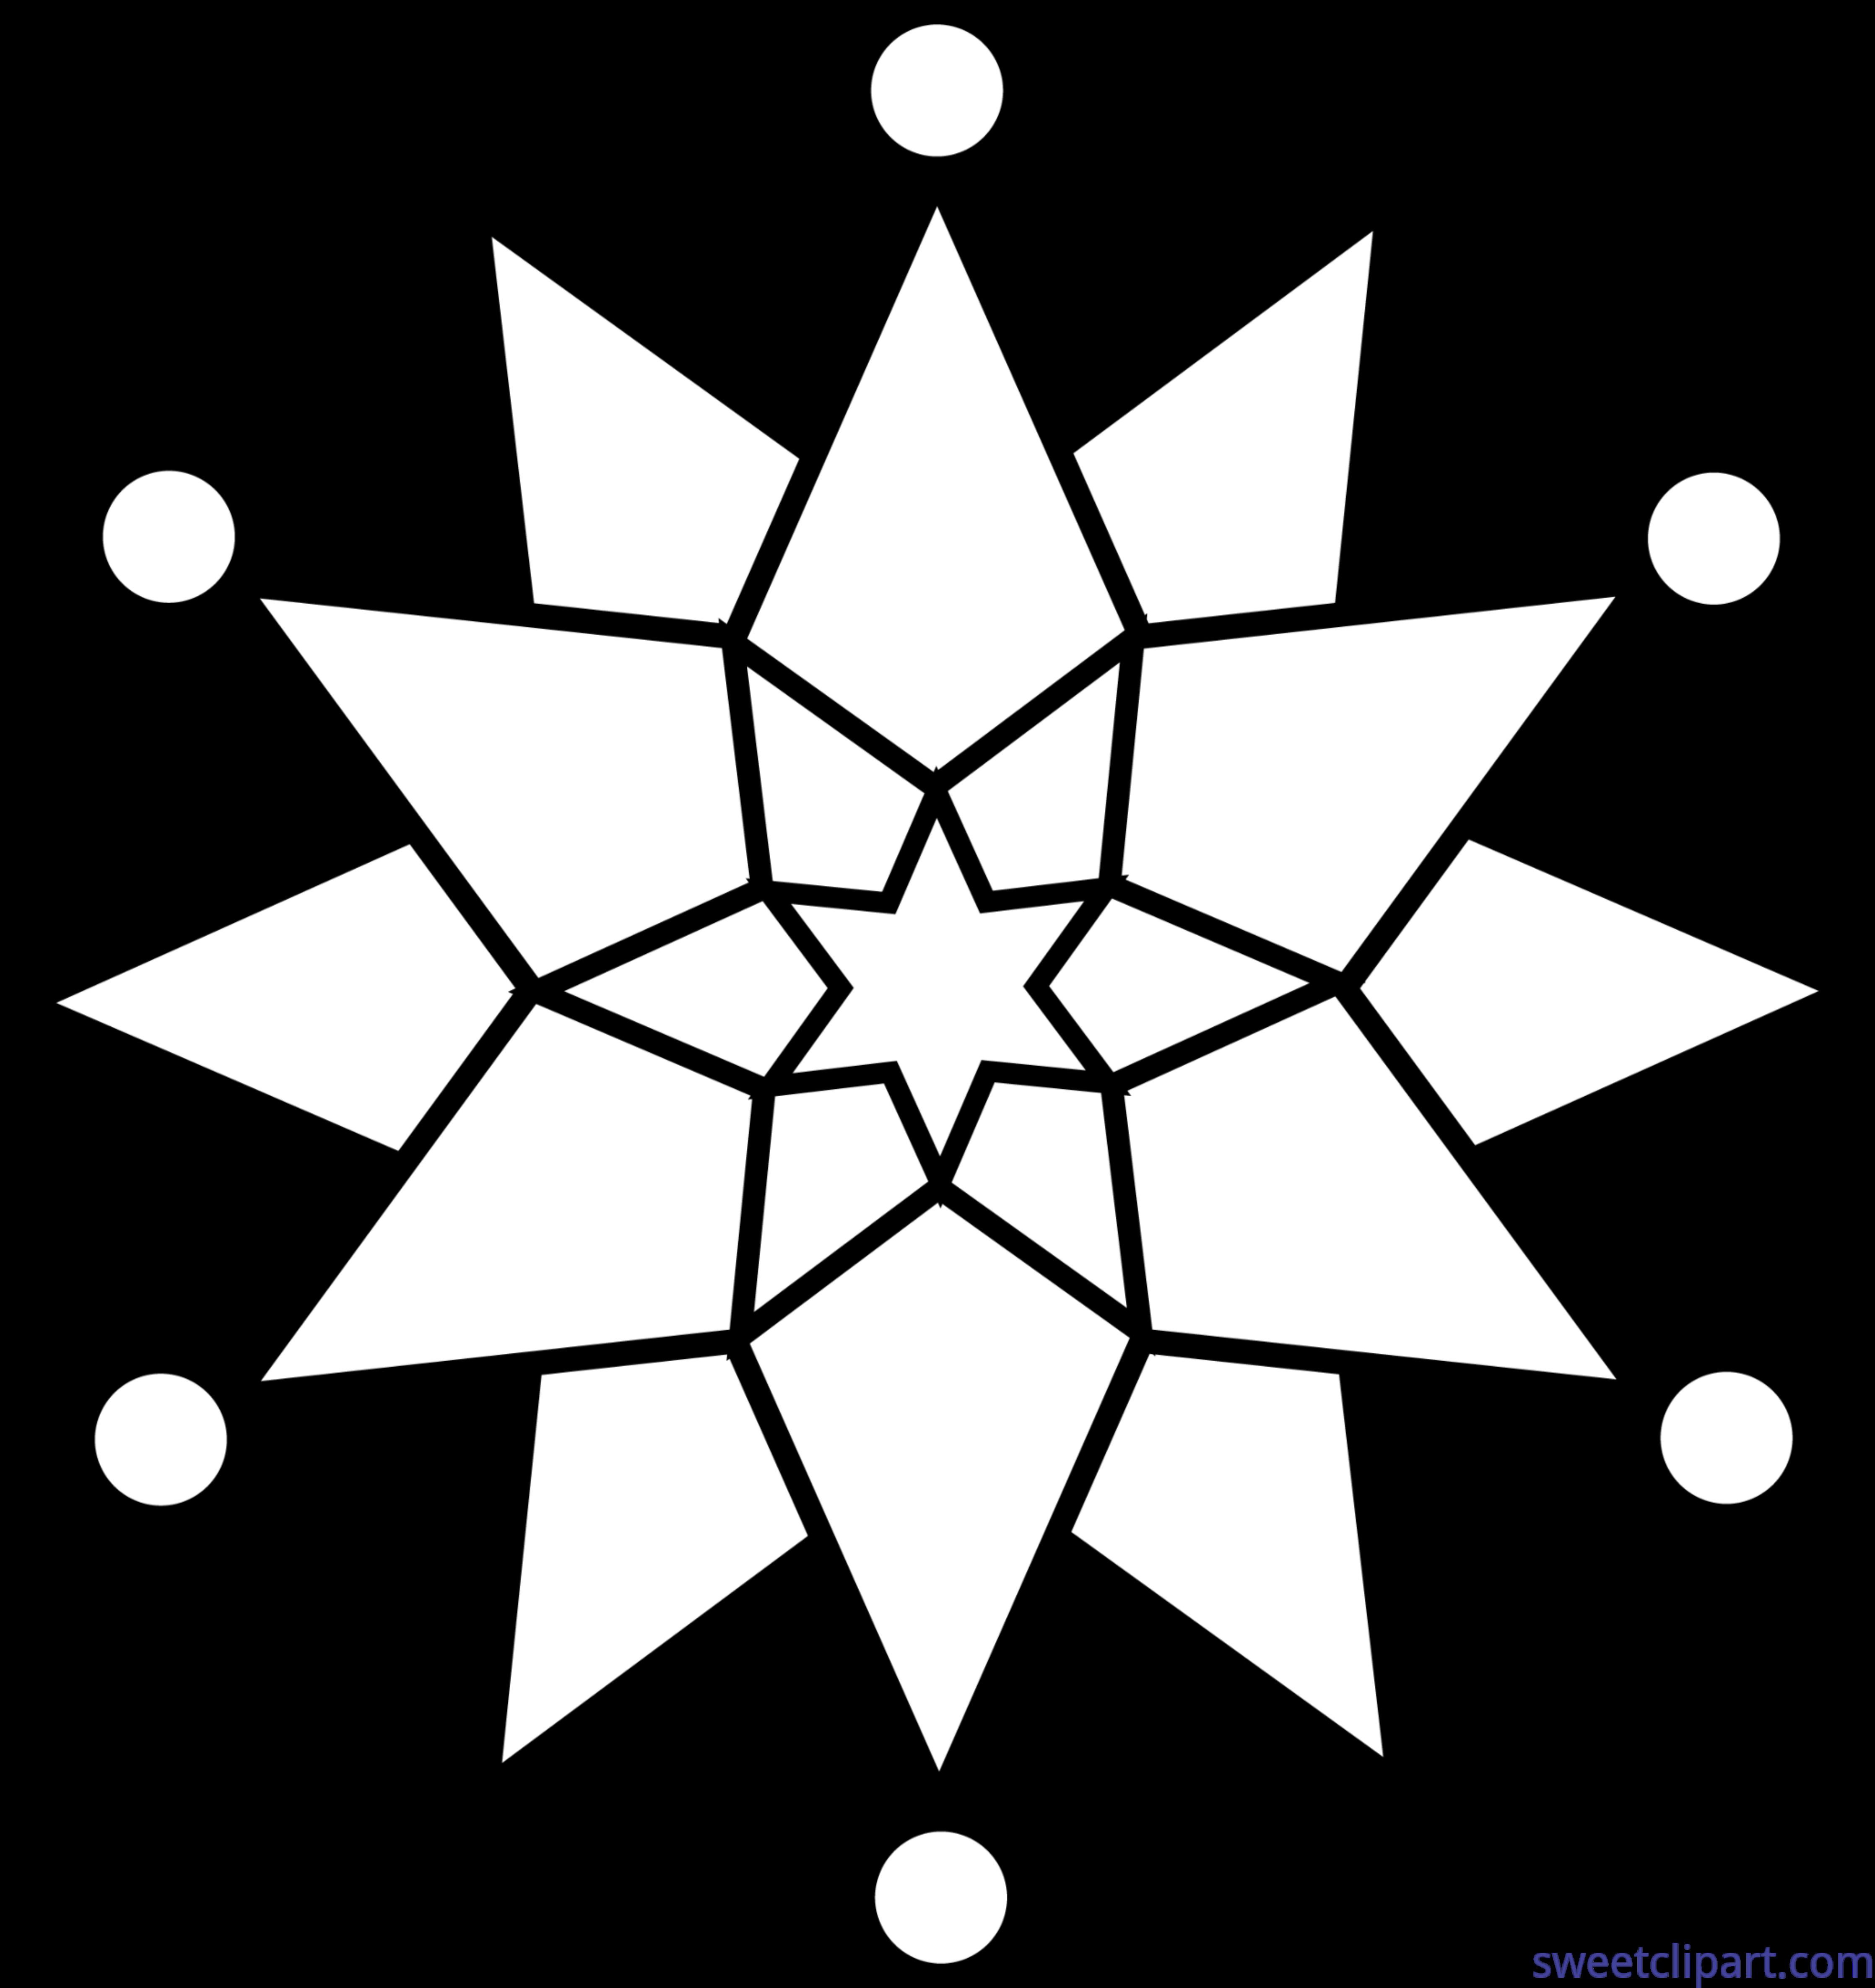 Snowflake circle clipart image freeuse Snowflake Lineart Clip Art - Sweet Clip Art image freeuse